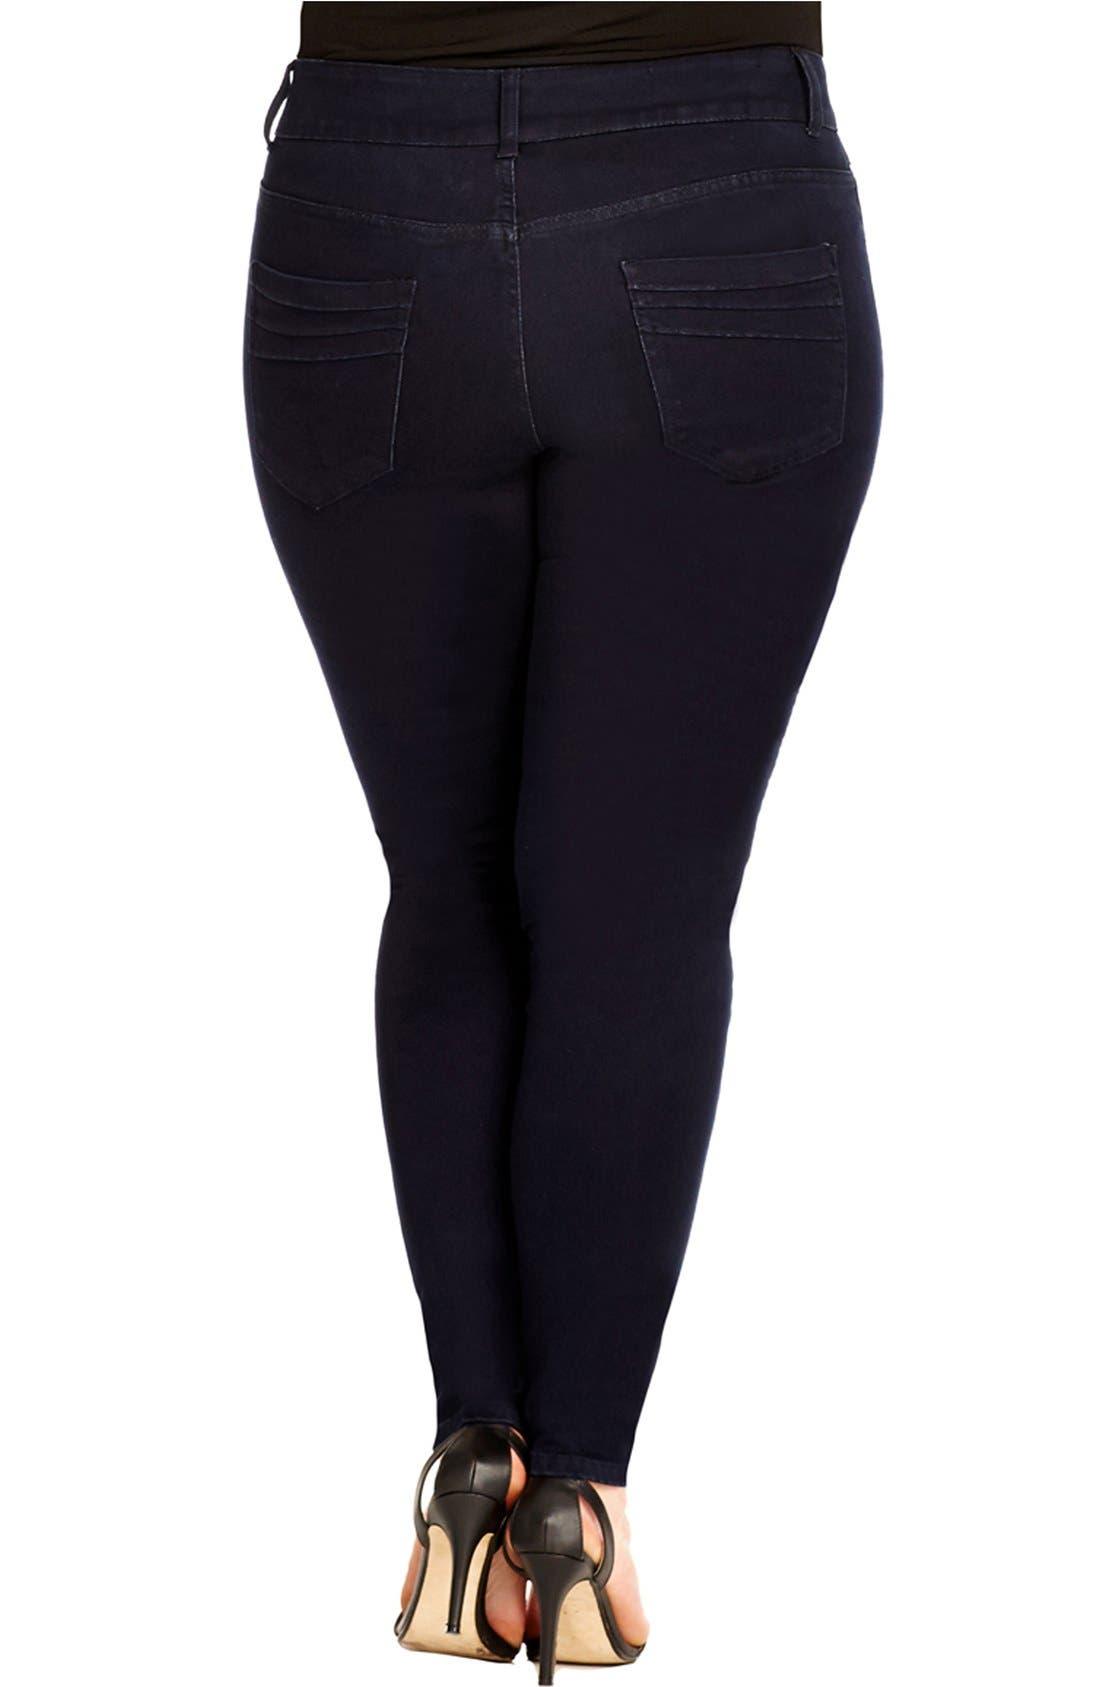 Alternate Image 2  - City Chic 'Moto' Stretch Skinny Jeans (Dark Denim) (Plus Size)